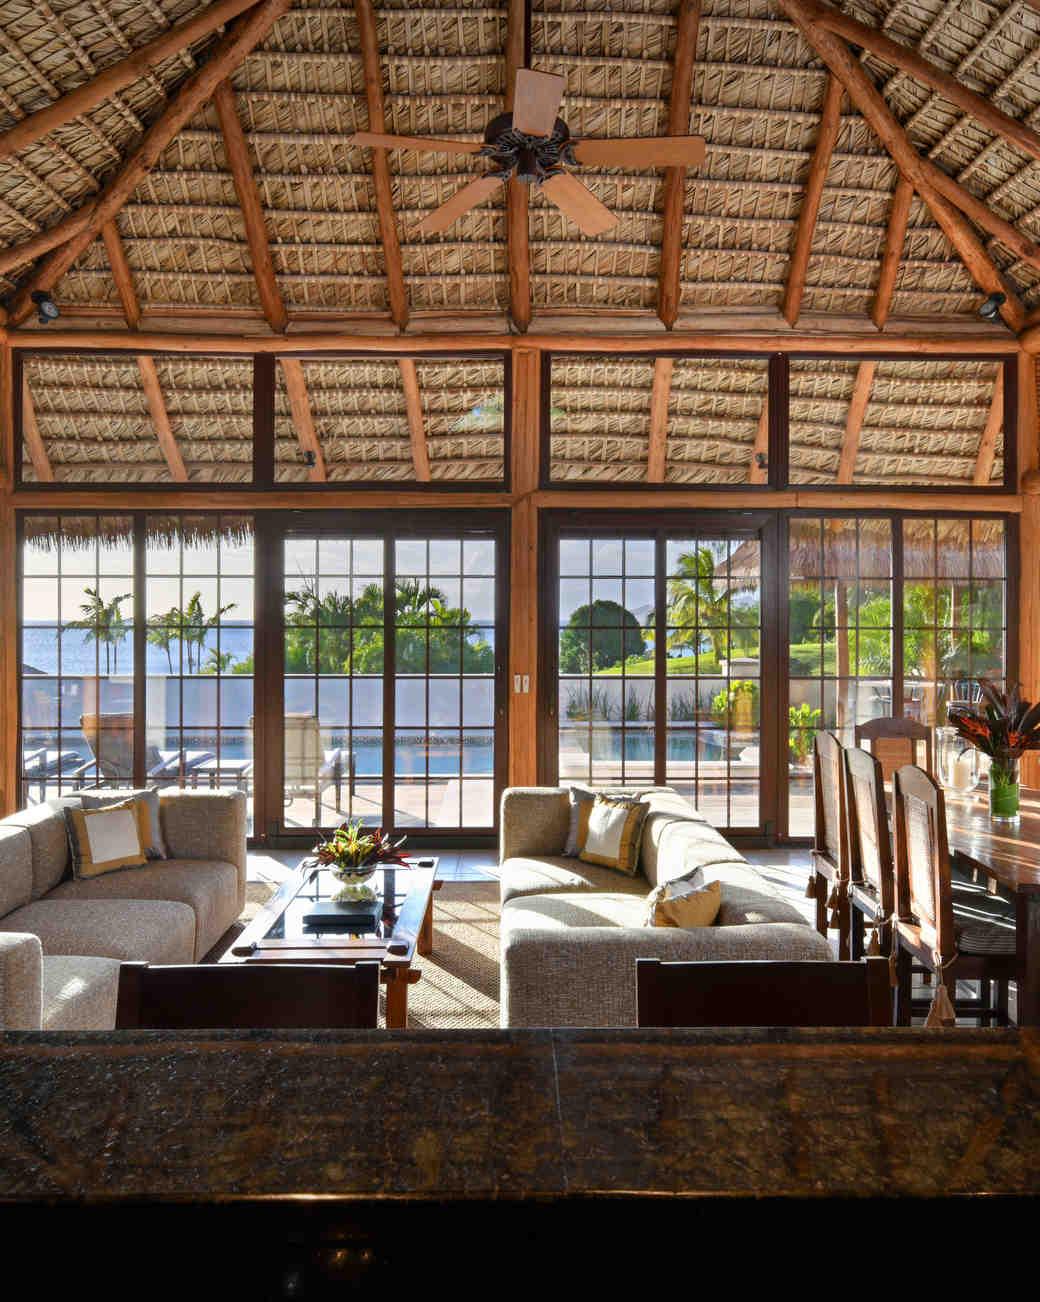 private-islands-paradise-beach-living-dining-room-1015.jpg